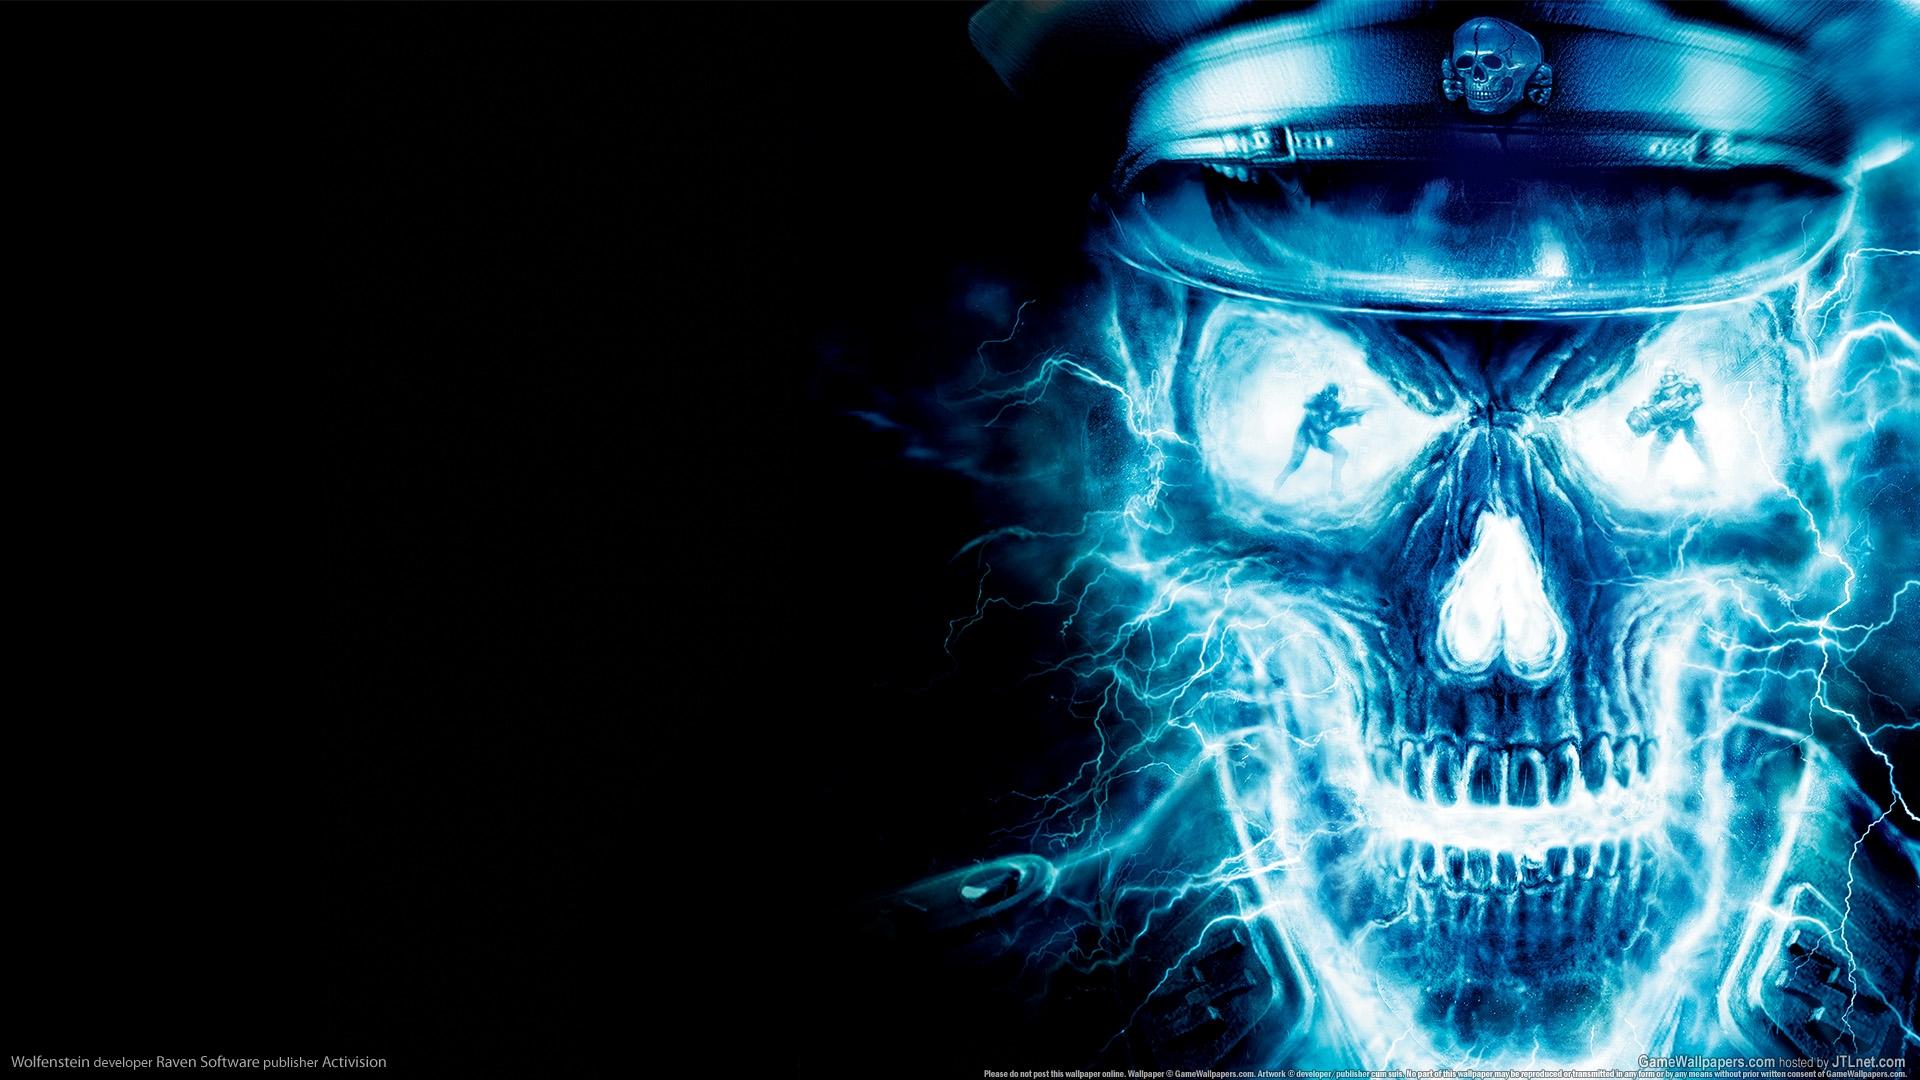 Cool-Skulls-Pulse-1920×1080-Awesome-skull-backgrounds-Adorab-wallpaper-wp3804050